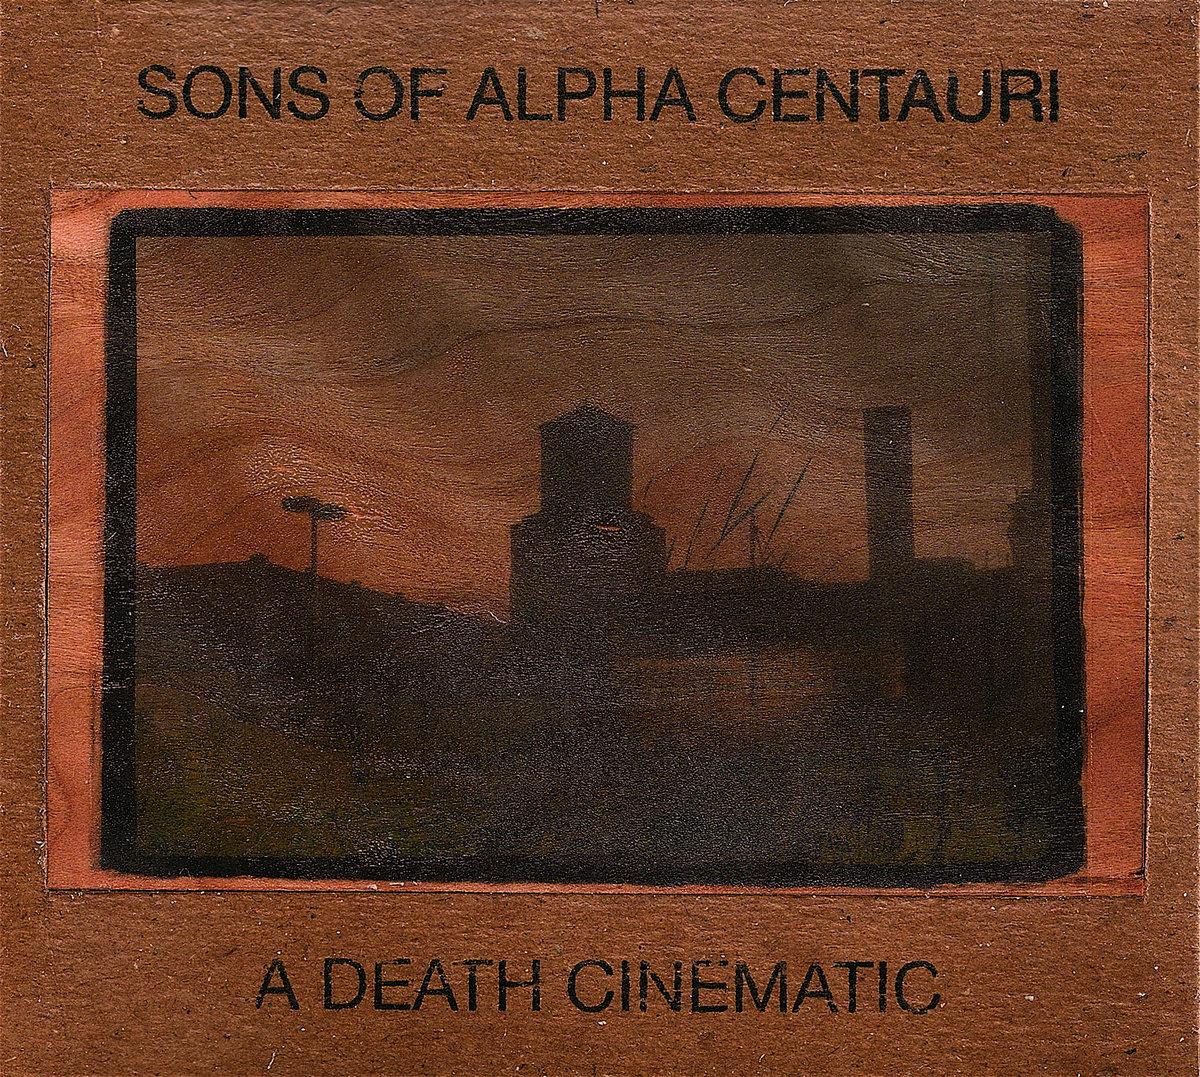 sons of alpha centauri/ a death cinematic split | a death